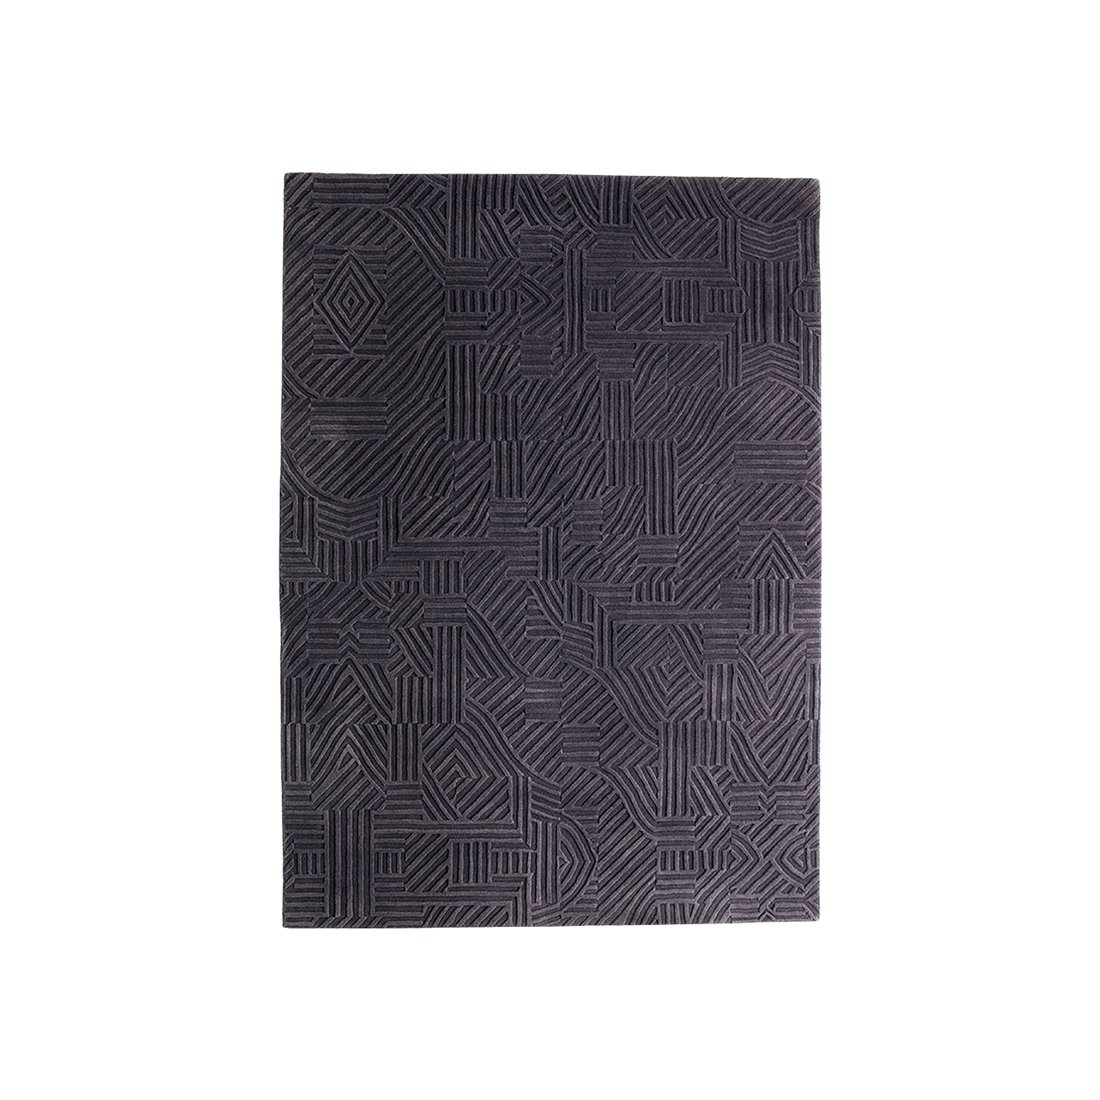 Nanimarquina African Pattern 3 Vloerkleed Small - Zwart/Paars